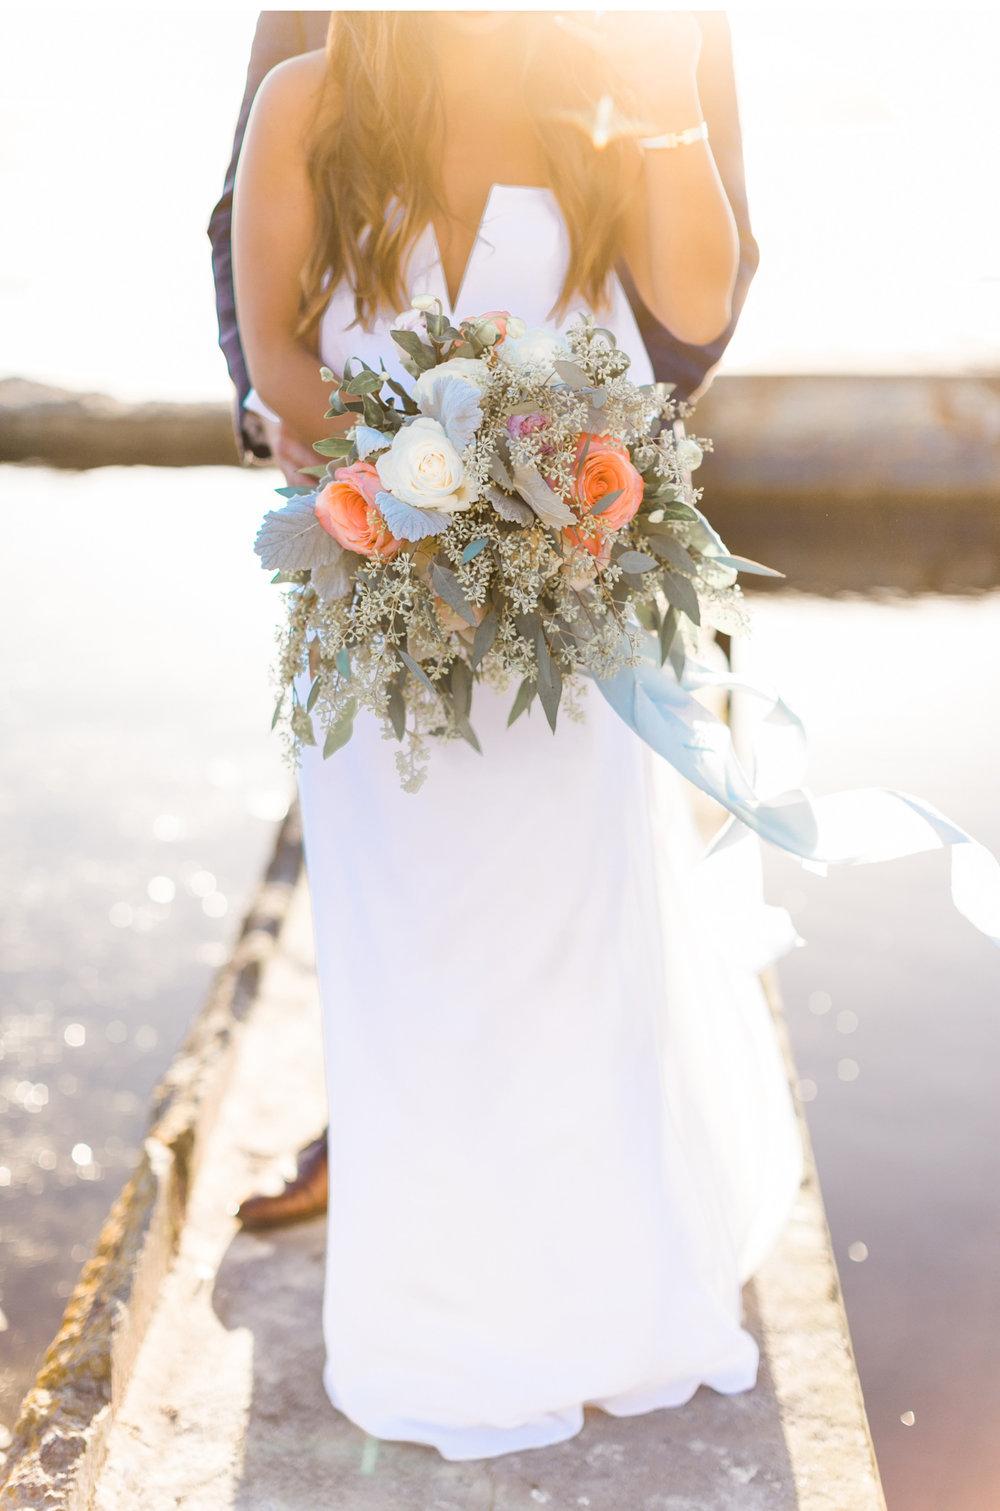 Sutro-Baths-Engagement-Natalie-Schutt-Photography-Style-Me-Pretty_08.jpg